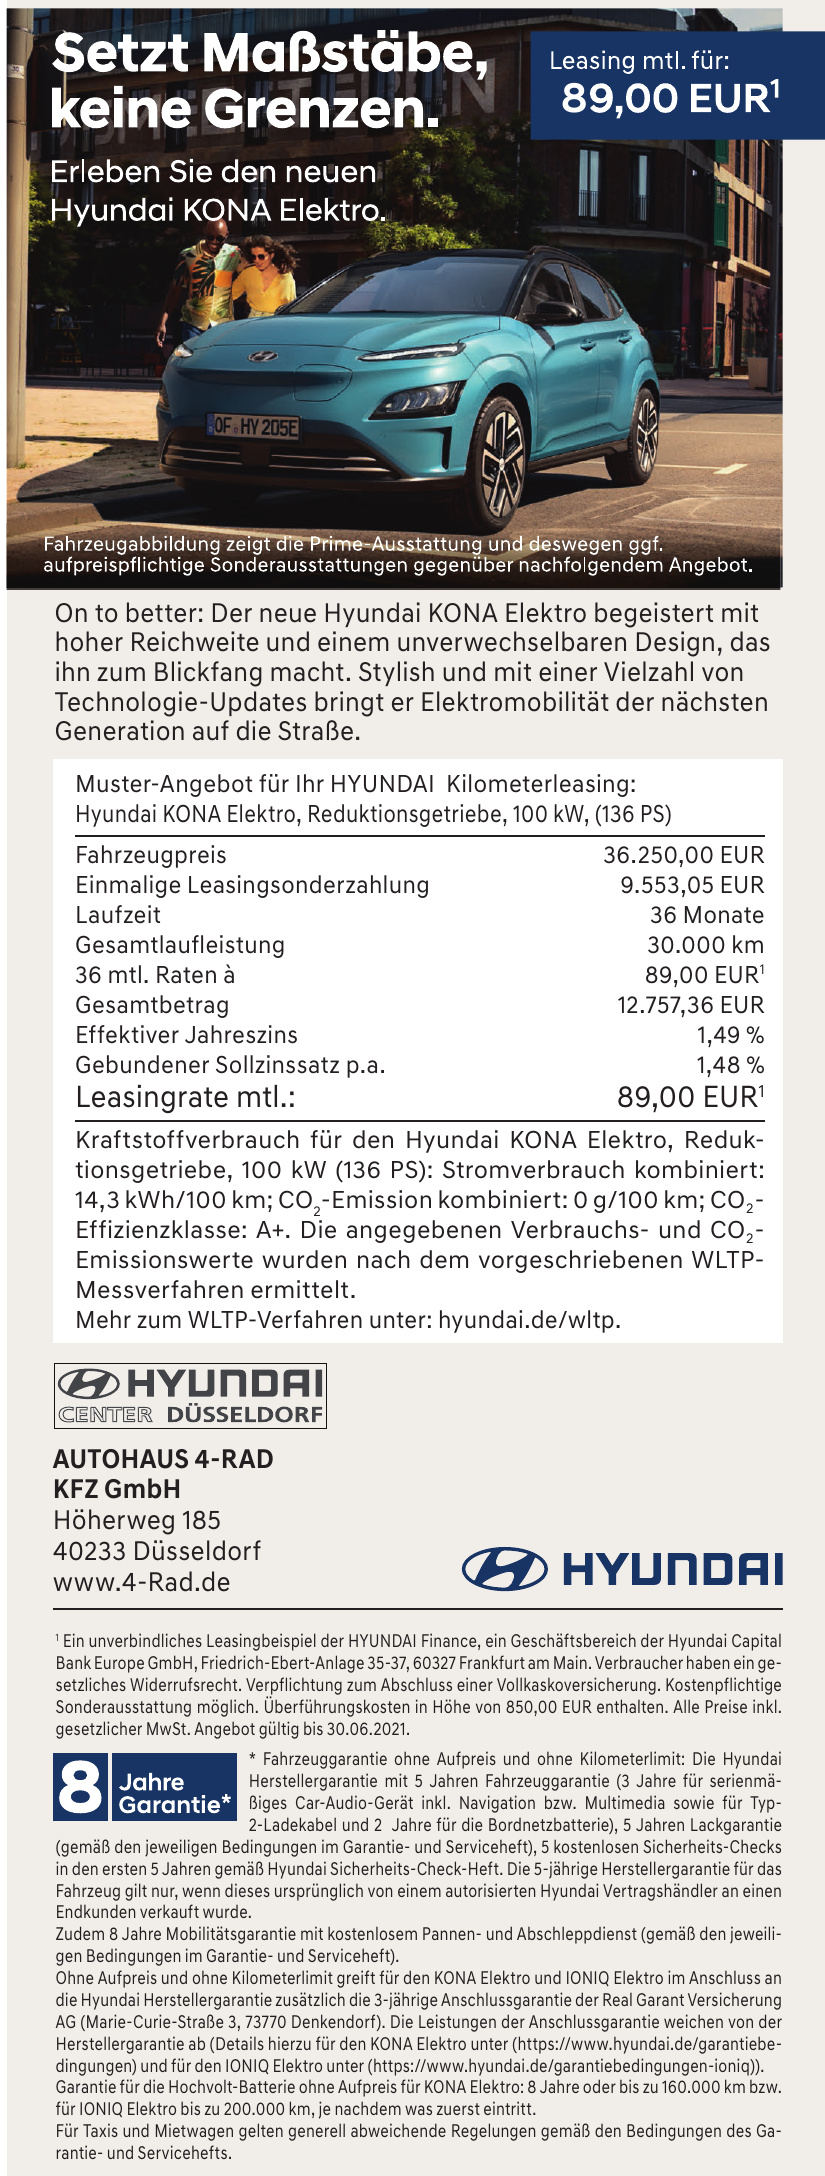 Autohaus 4-Rad Kfz GmbH